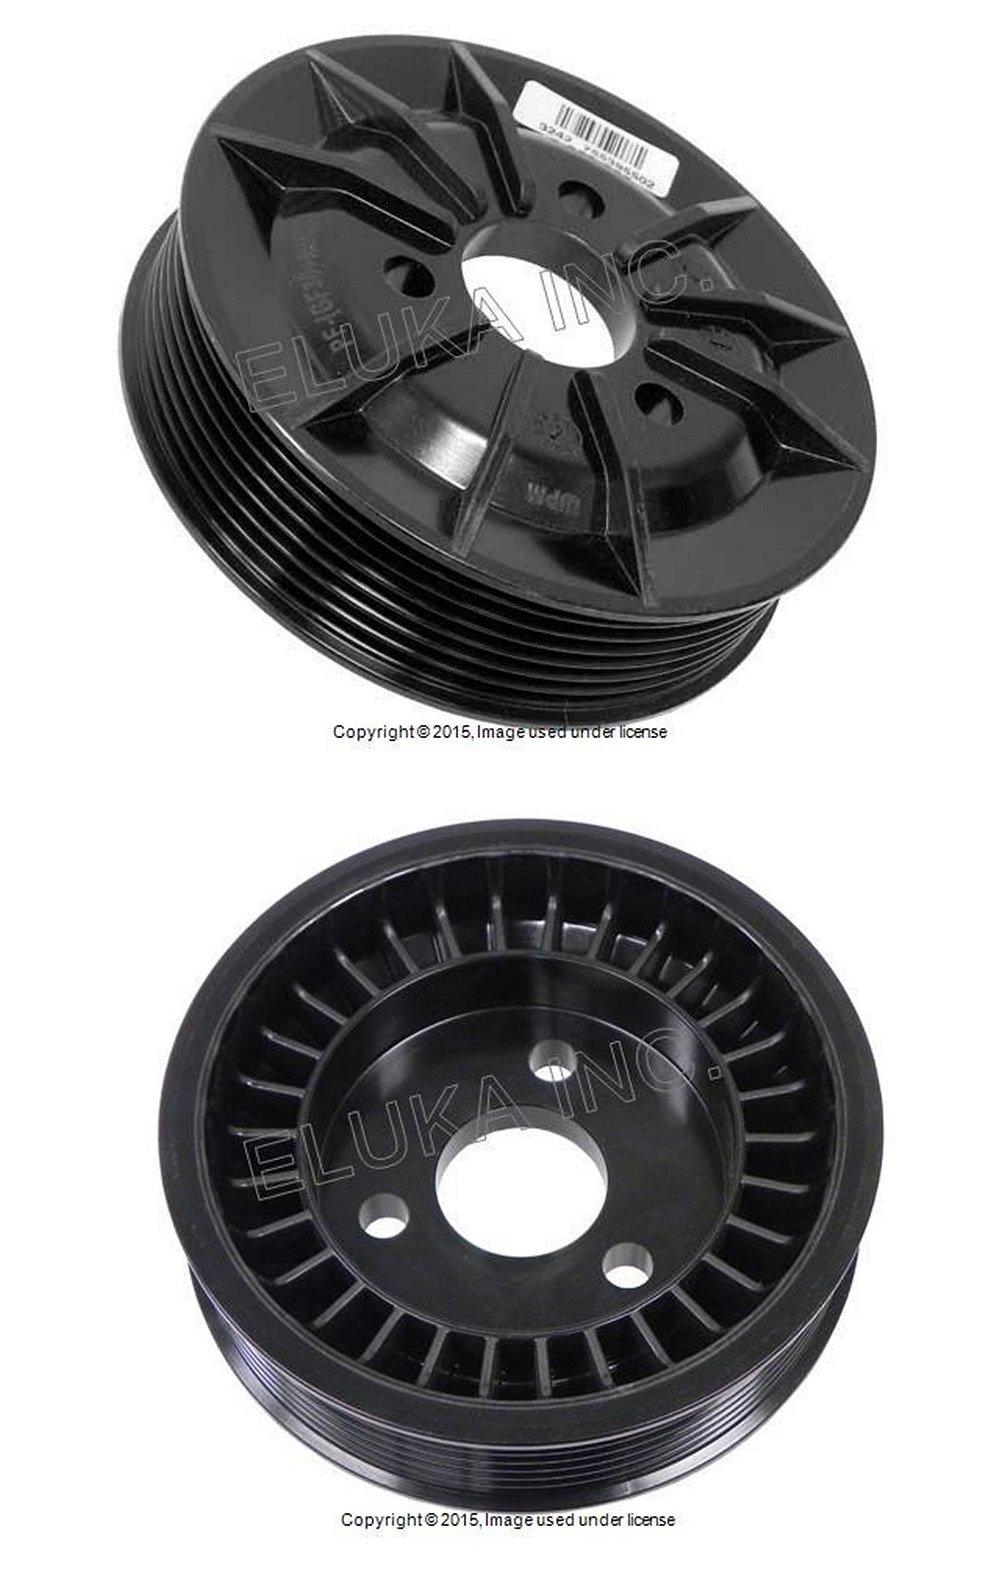 BMW Genuine Active Steering Pulley - Power Steering Pump 135i M Coupé 135i 335i 335xi 335i 335xi 335i 335xi 335is 335i 335is